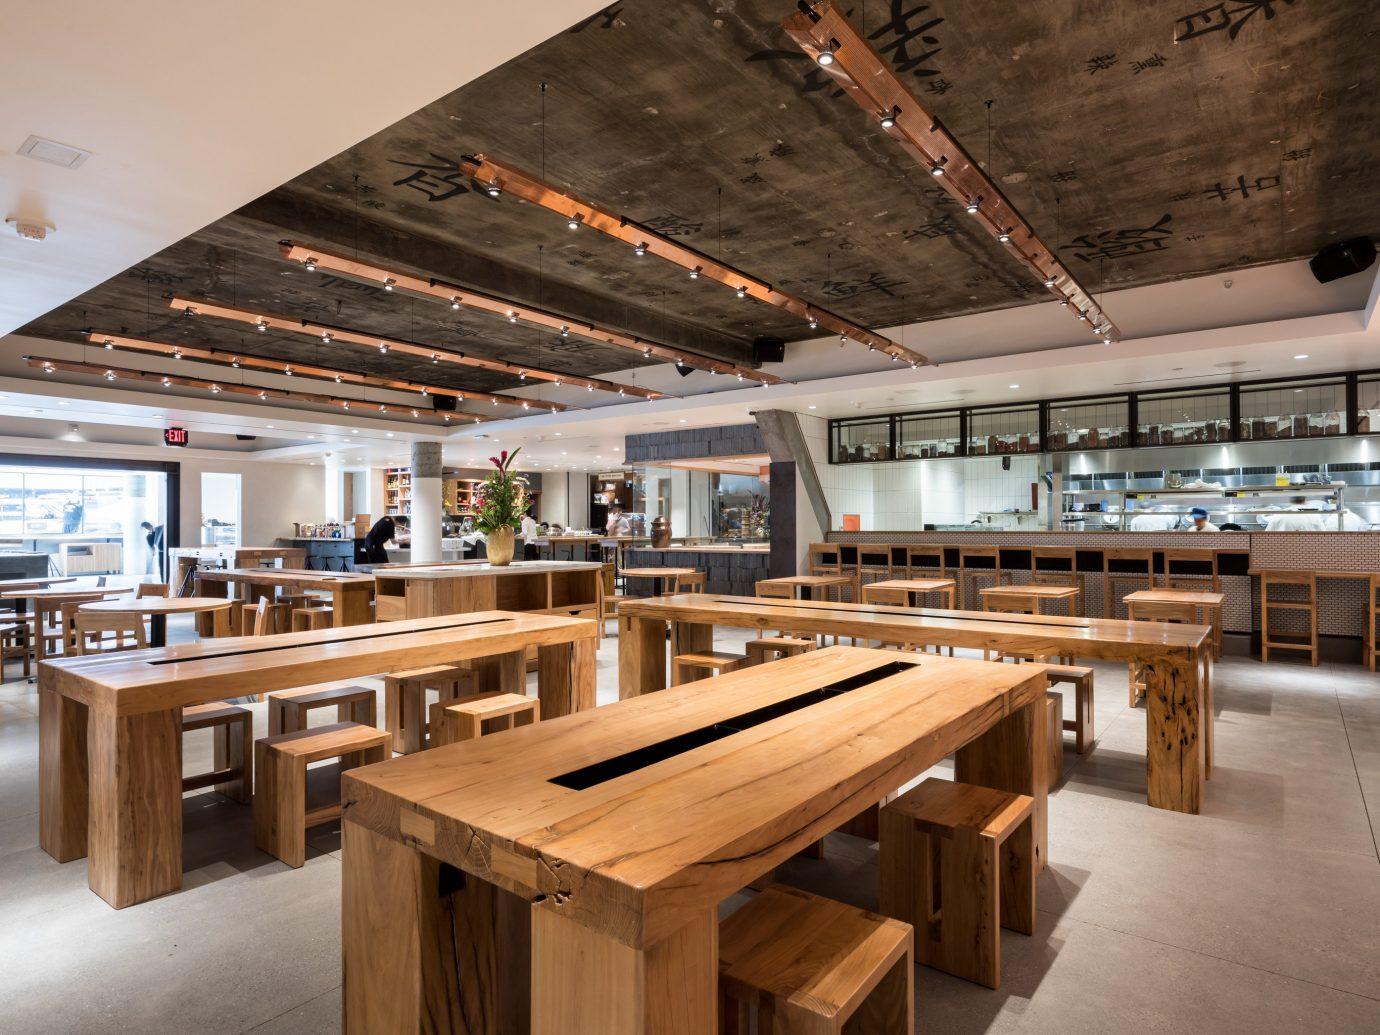 Food + Drink Travel Tips indoor floor table ceiling Kitchen wooden furniture interior design wood restaurant counter